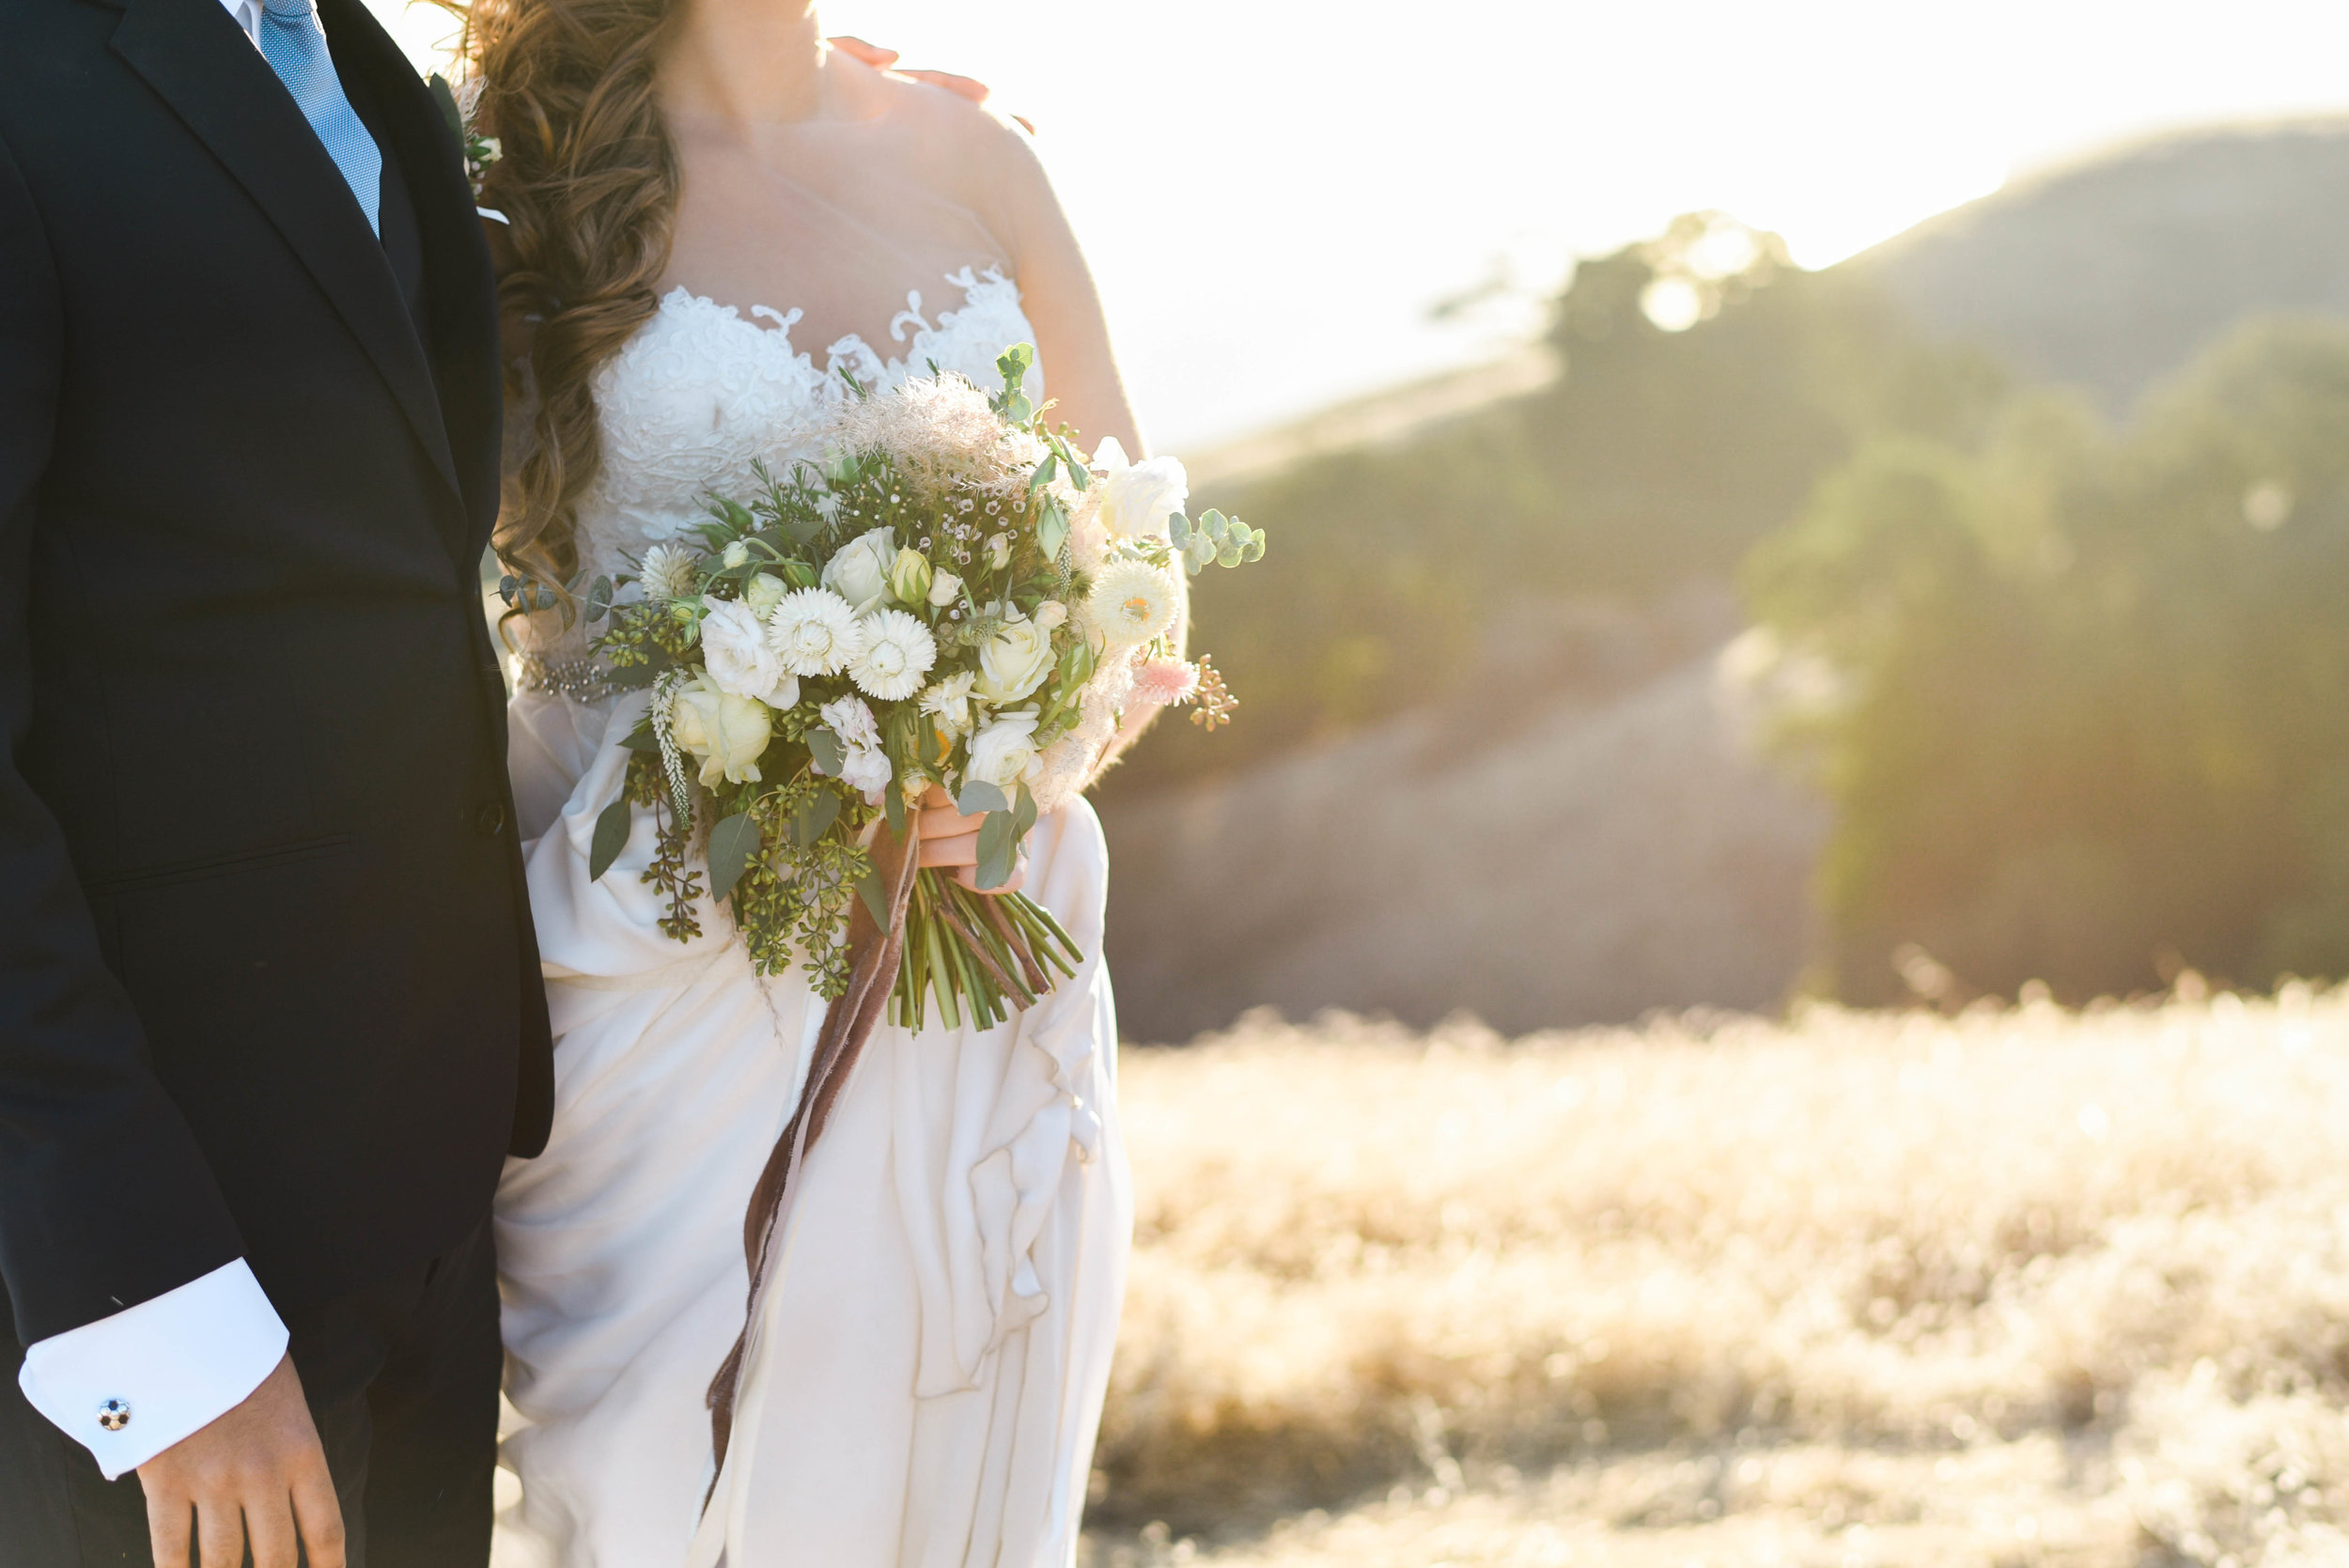 Ariel + Amr's Mt Tam Wedding - Northern California Wedding Inspiration | FarmGirl Flowers | Jillian Gorman Photography